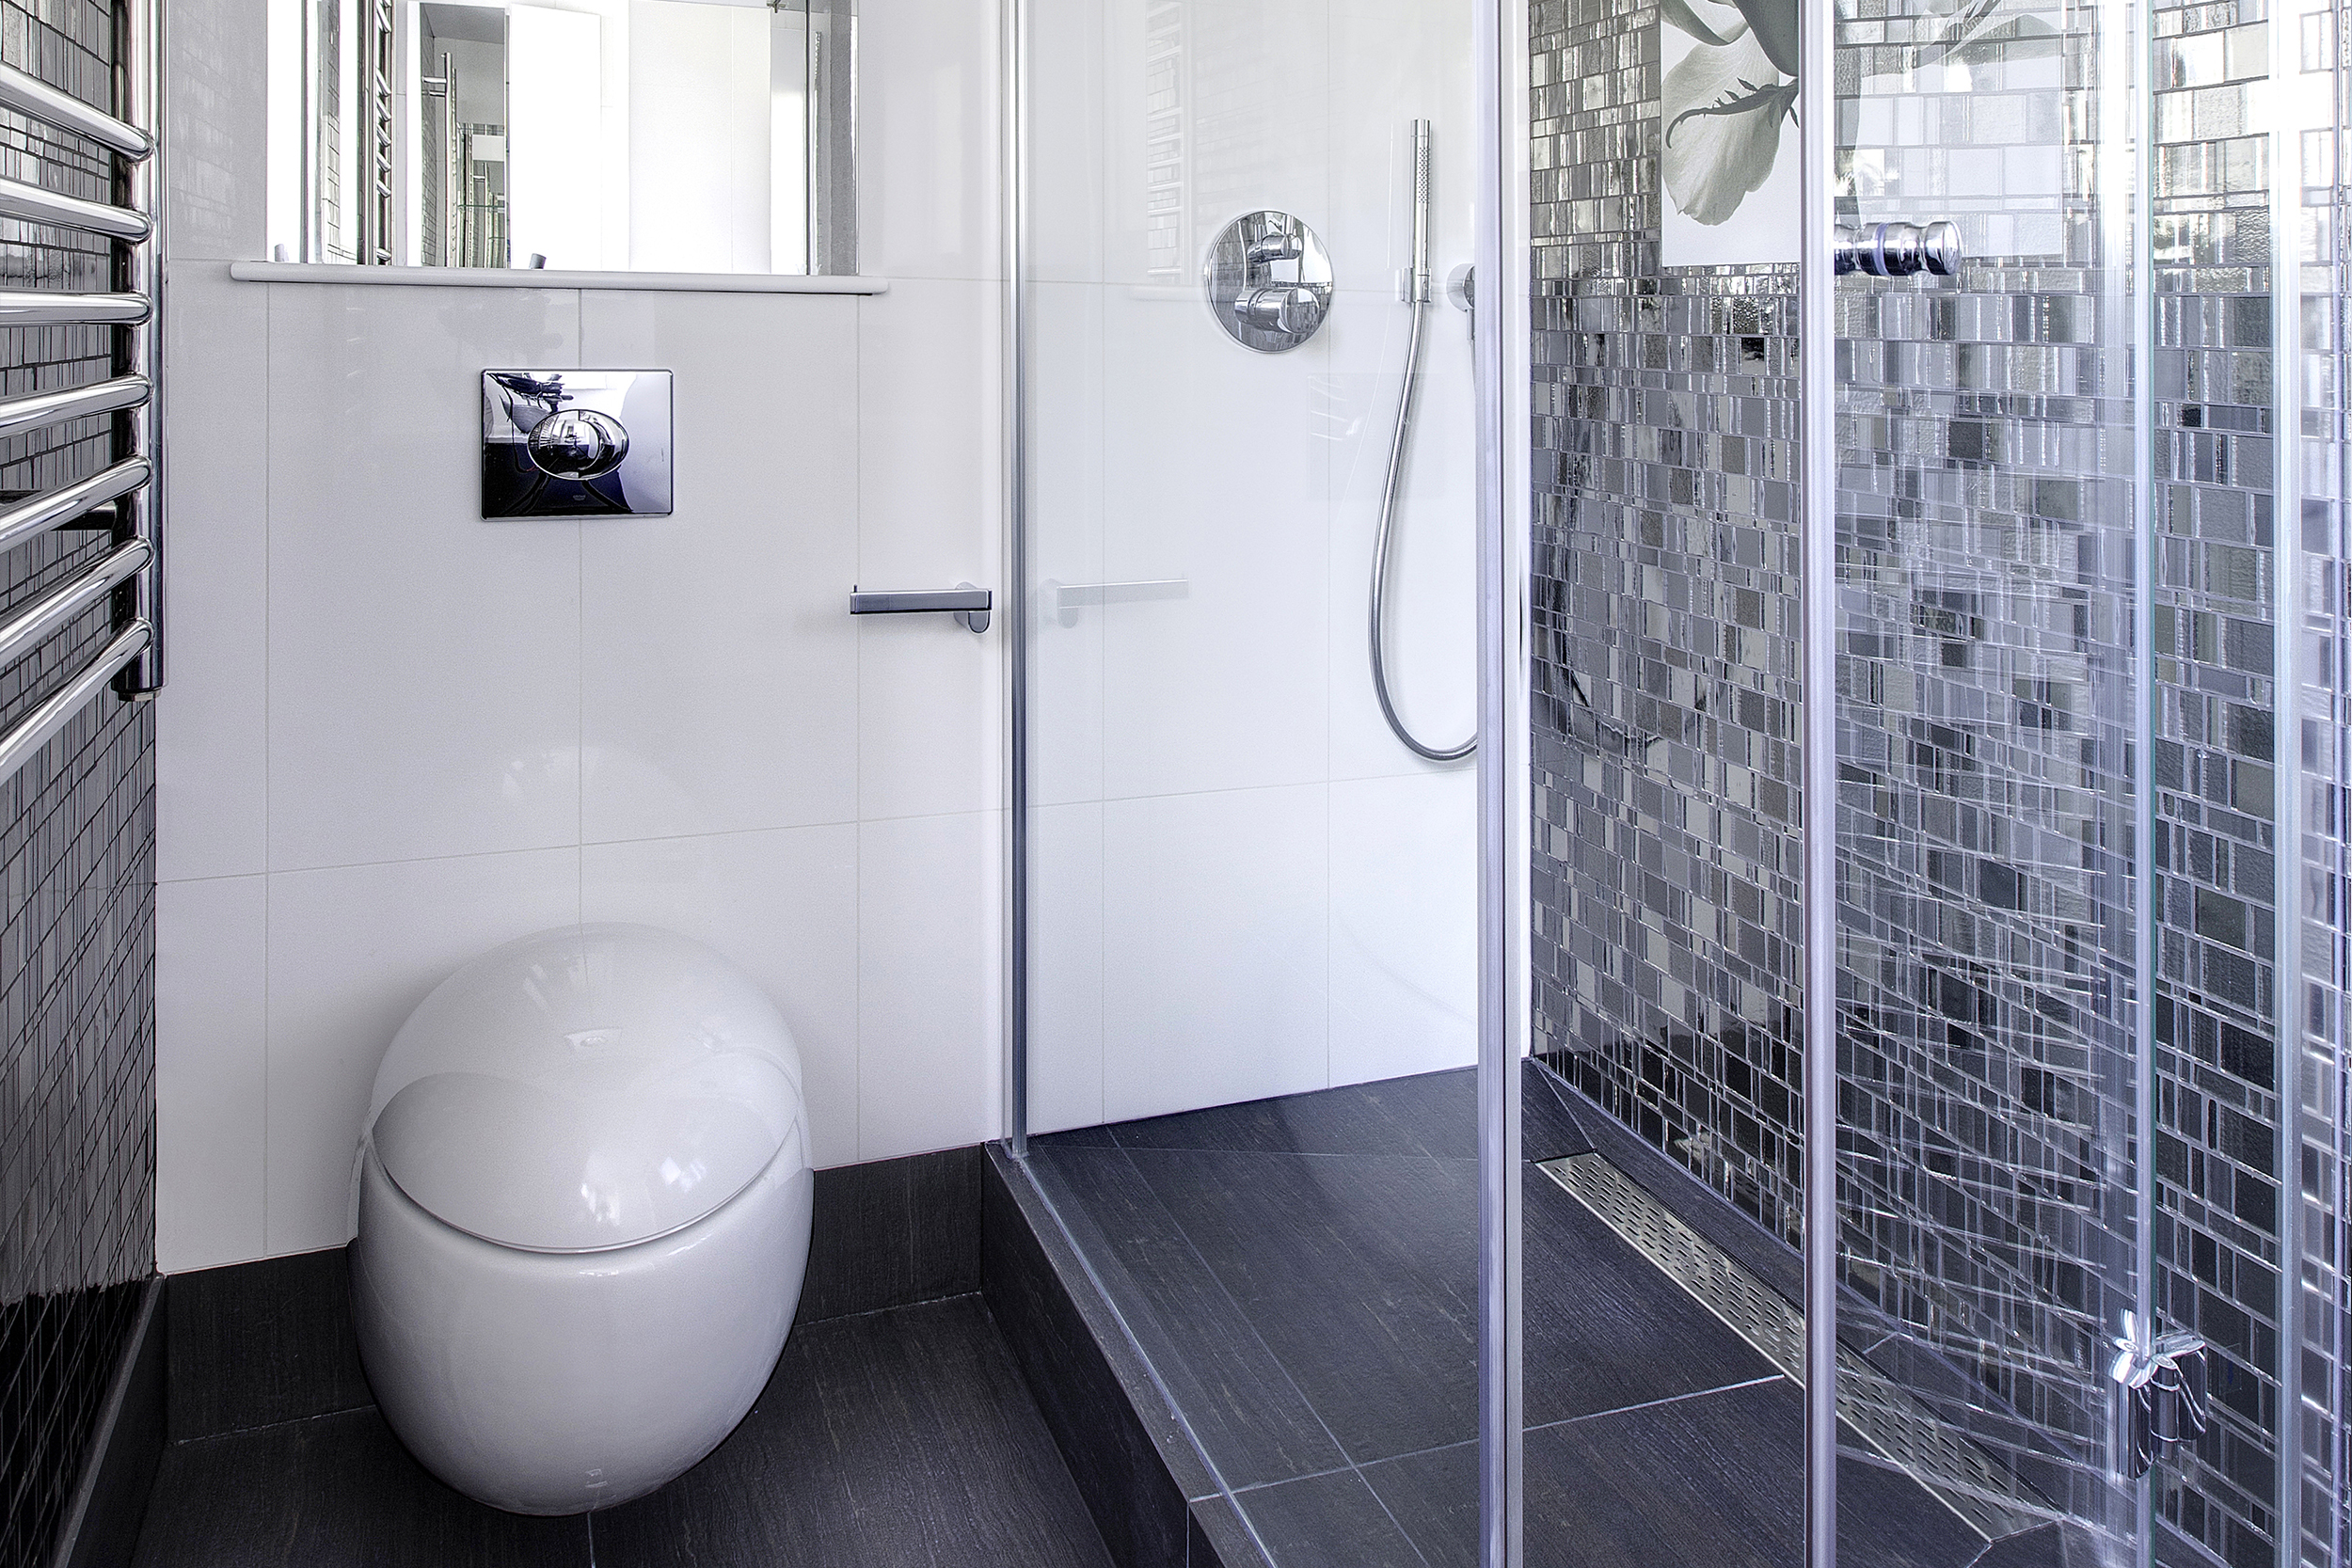 14-toilet